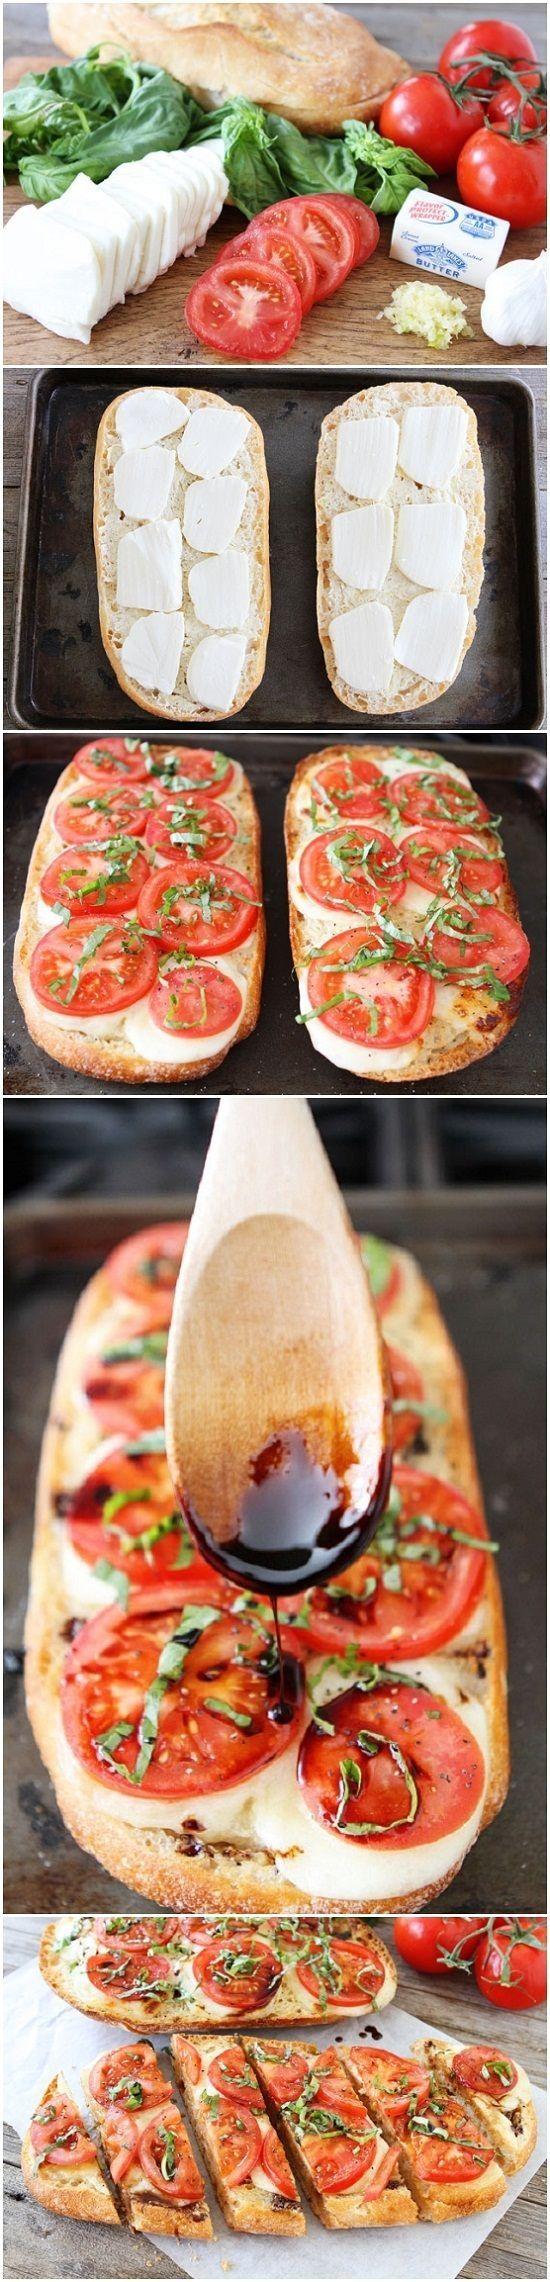 Caprese Garlic Bread looks good